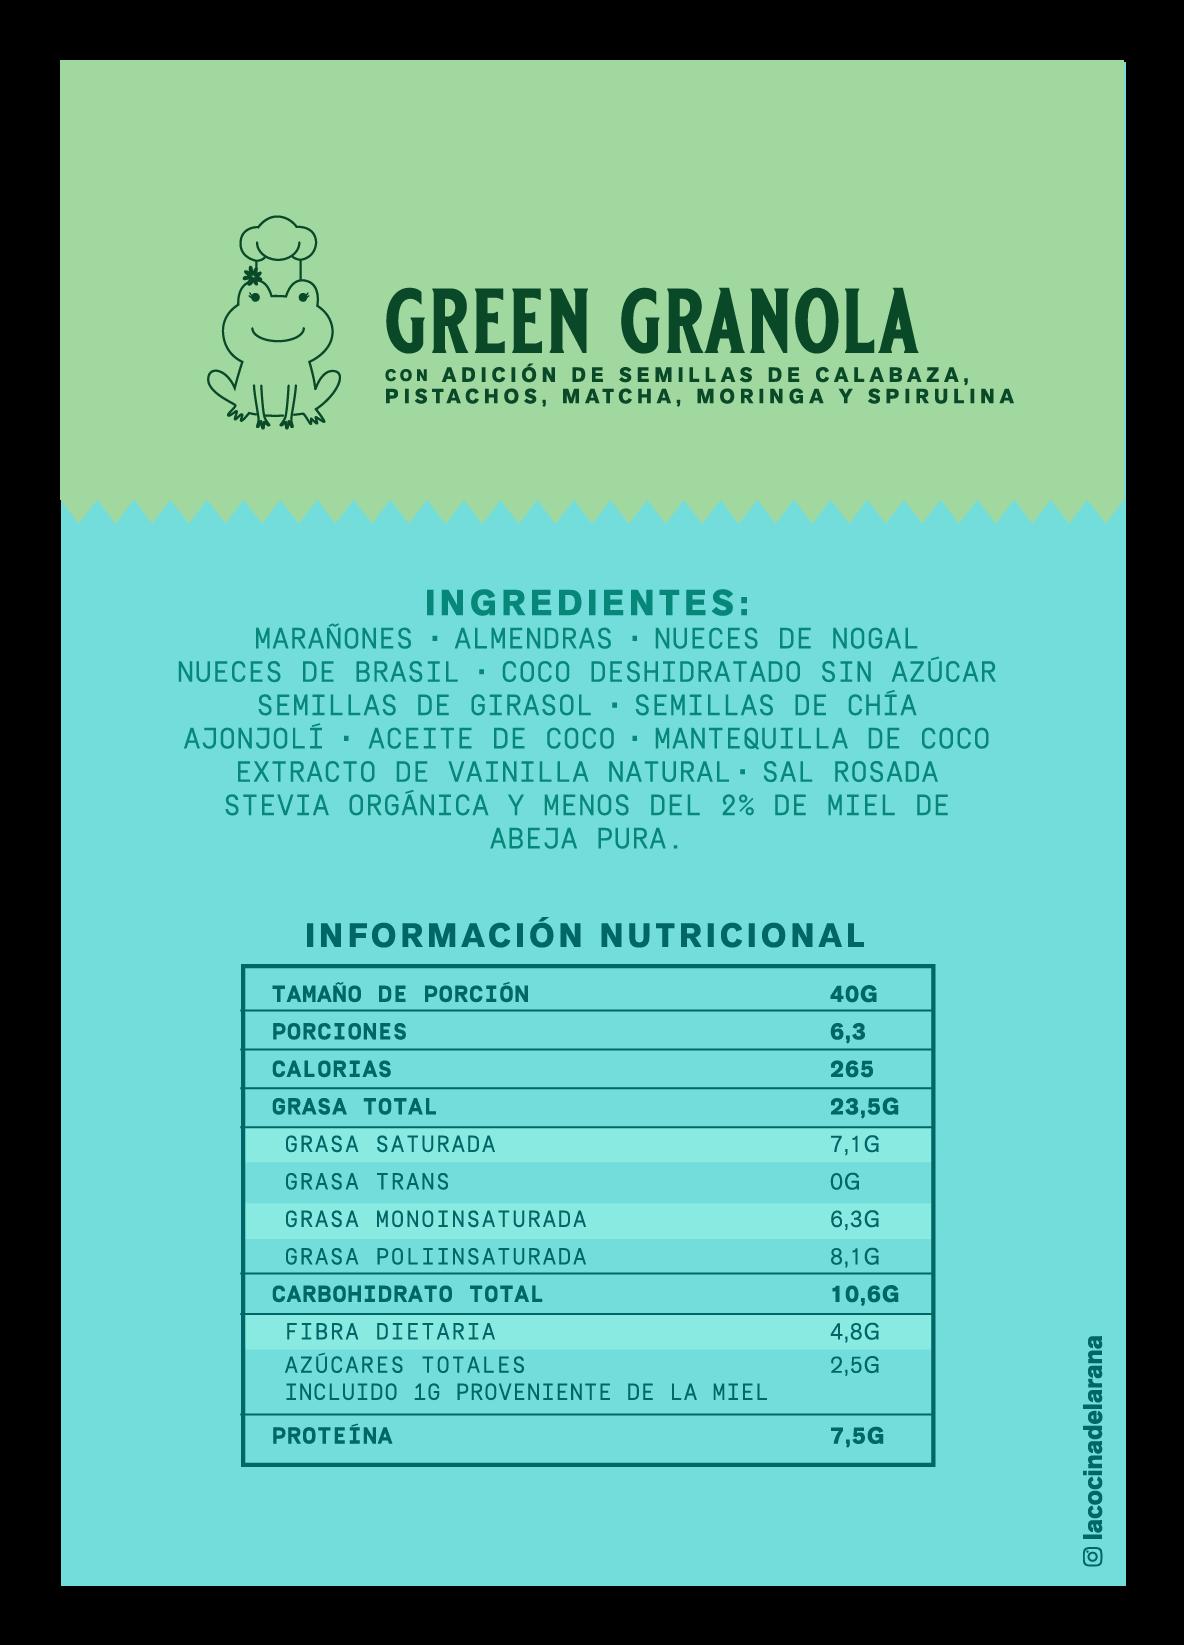 Green granola